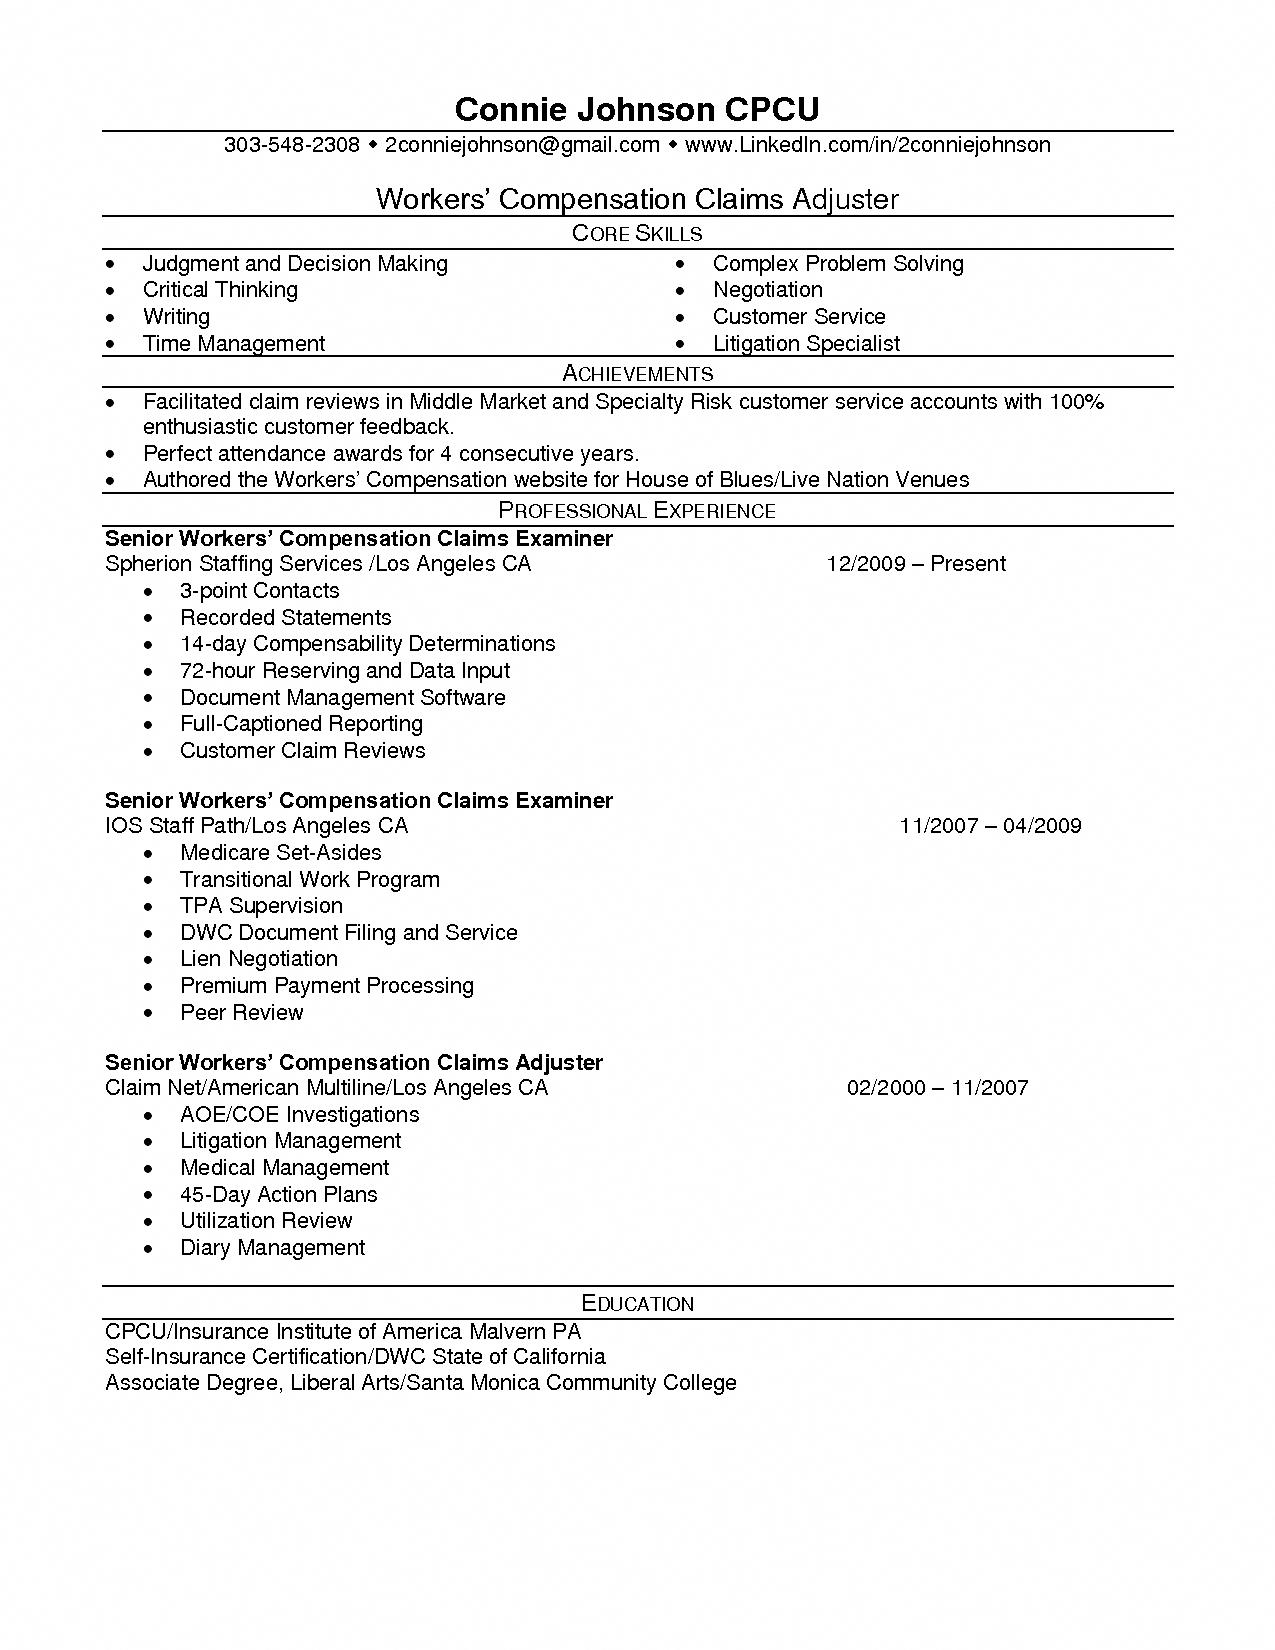 Mortgage Loan Processor Description Resume Objective MortgageGiftLetterTemplate